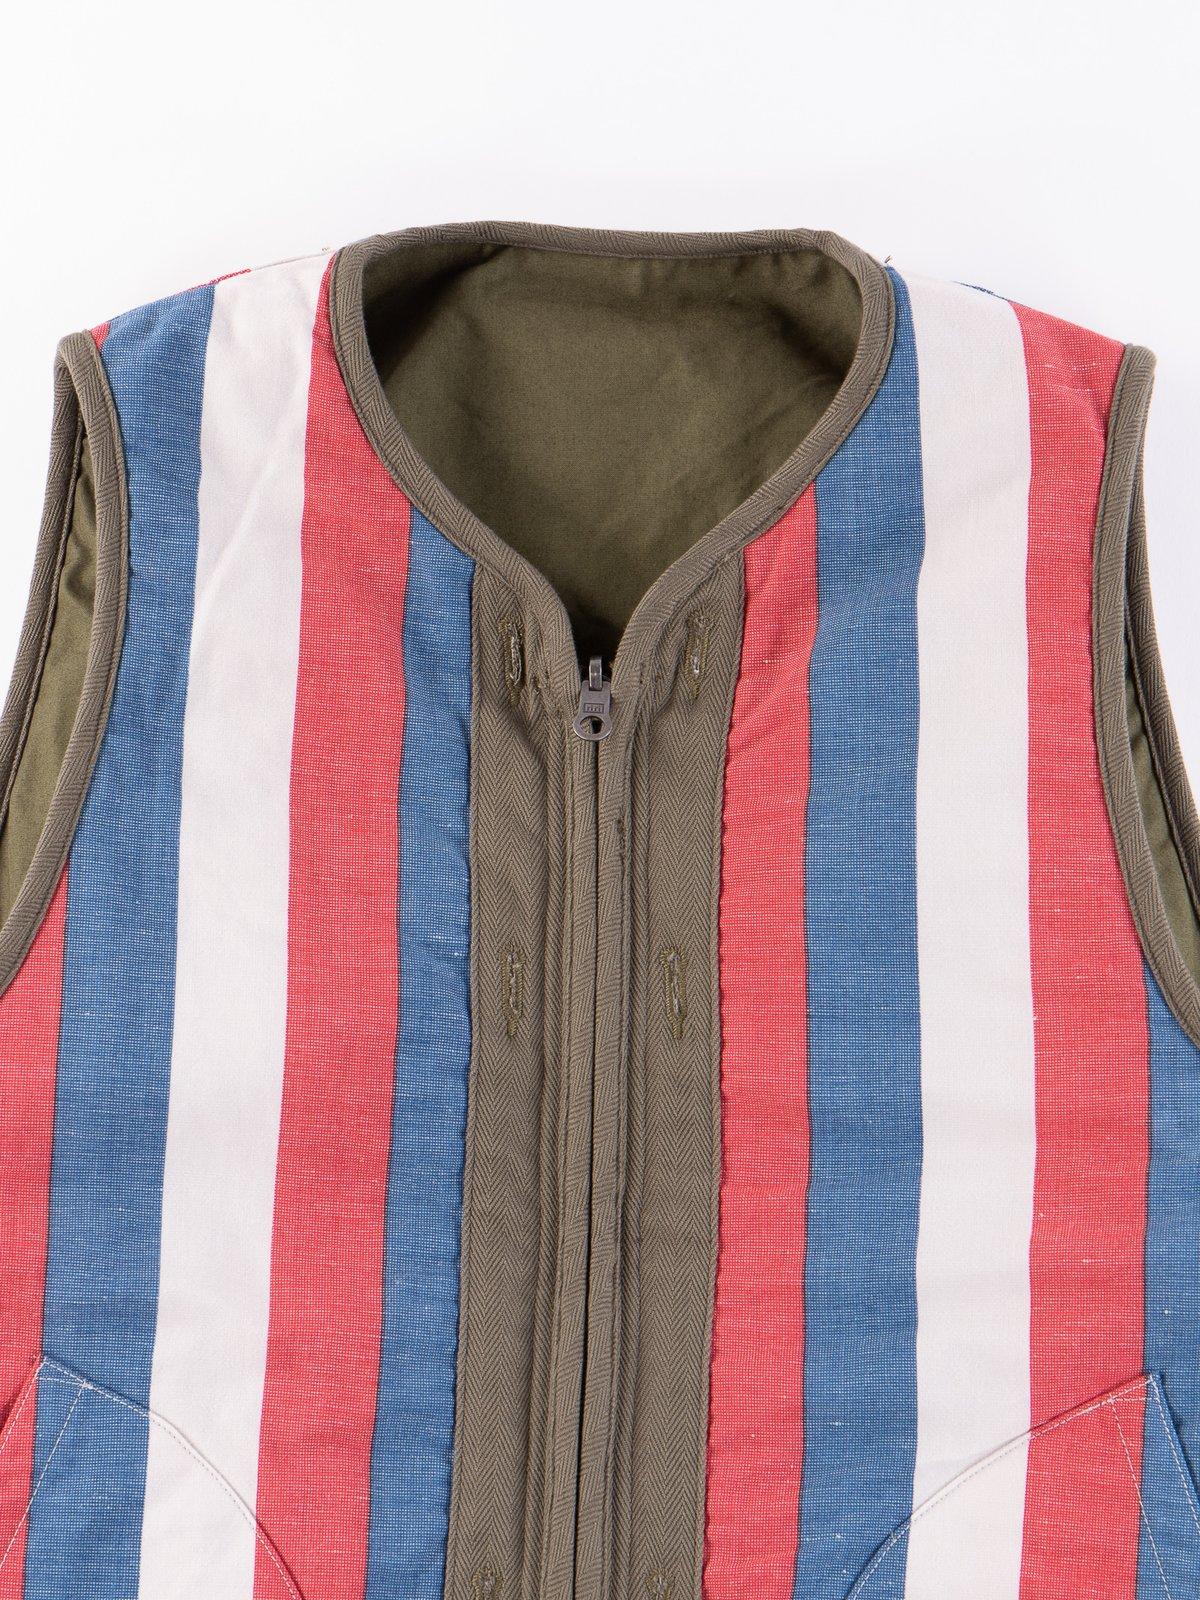 Olive Iris Cotton Liner Vest - Image 8